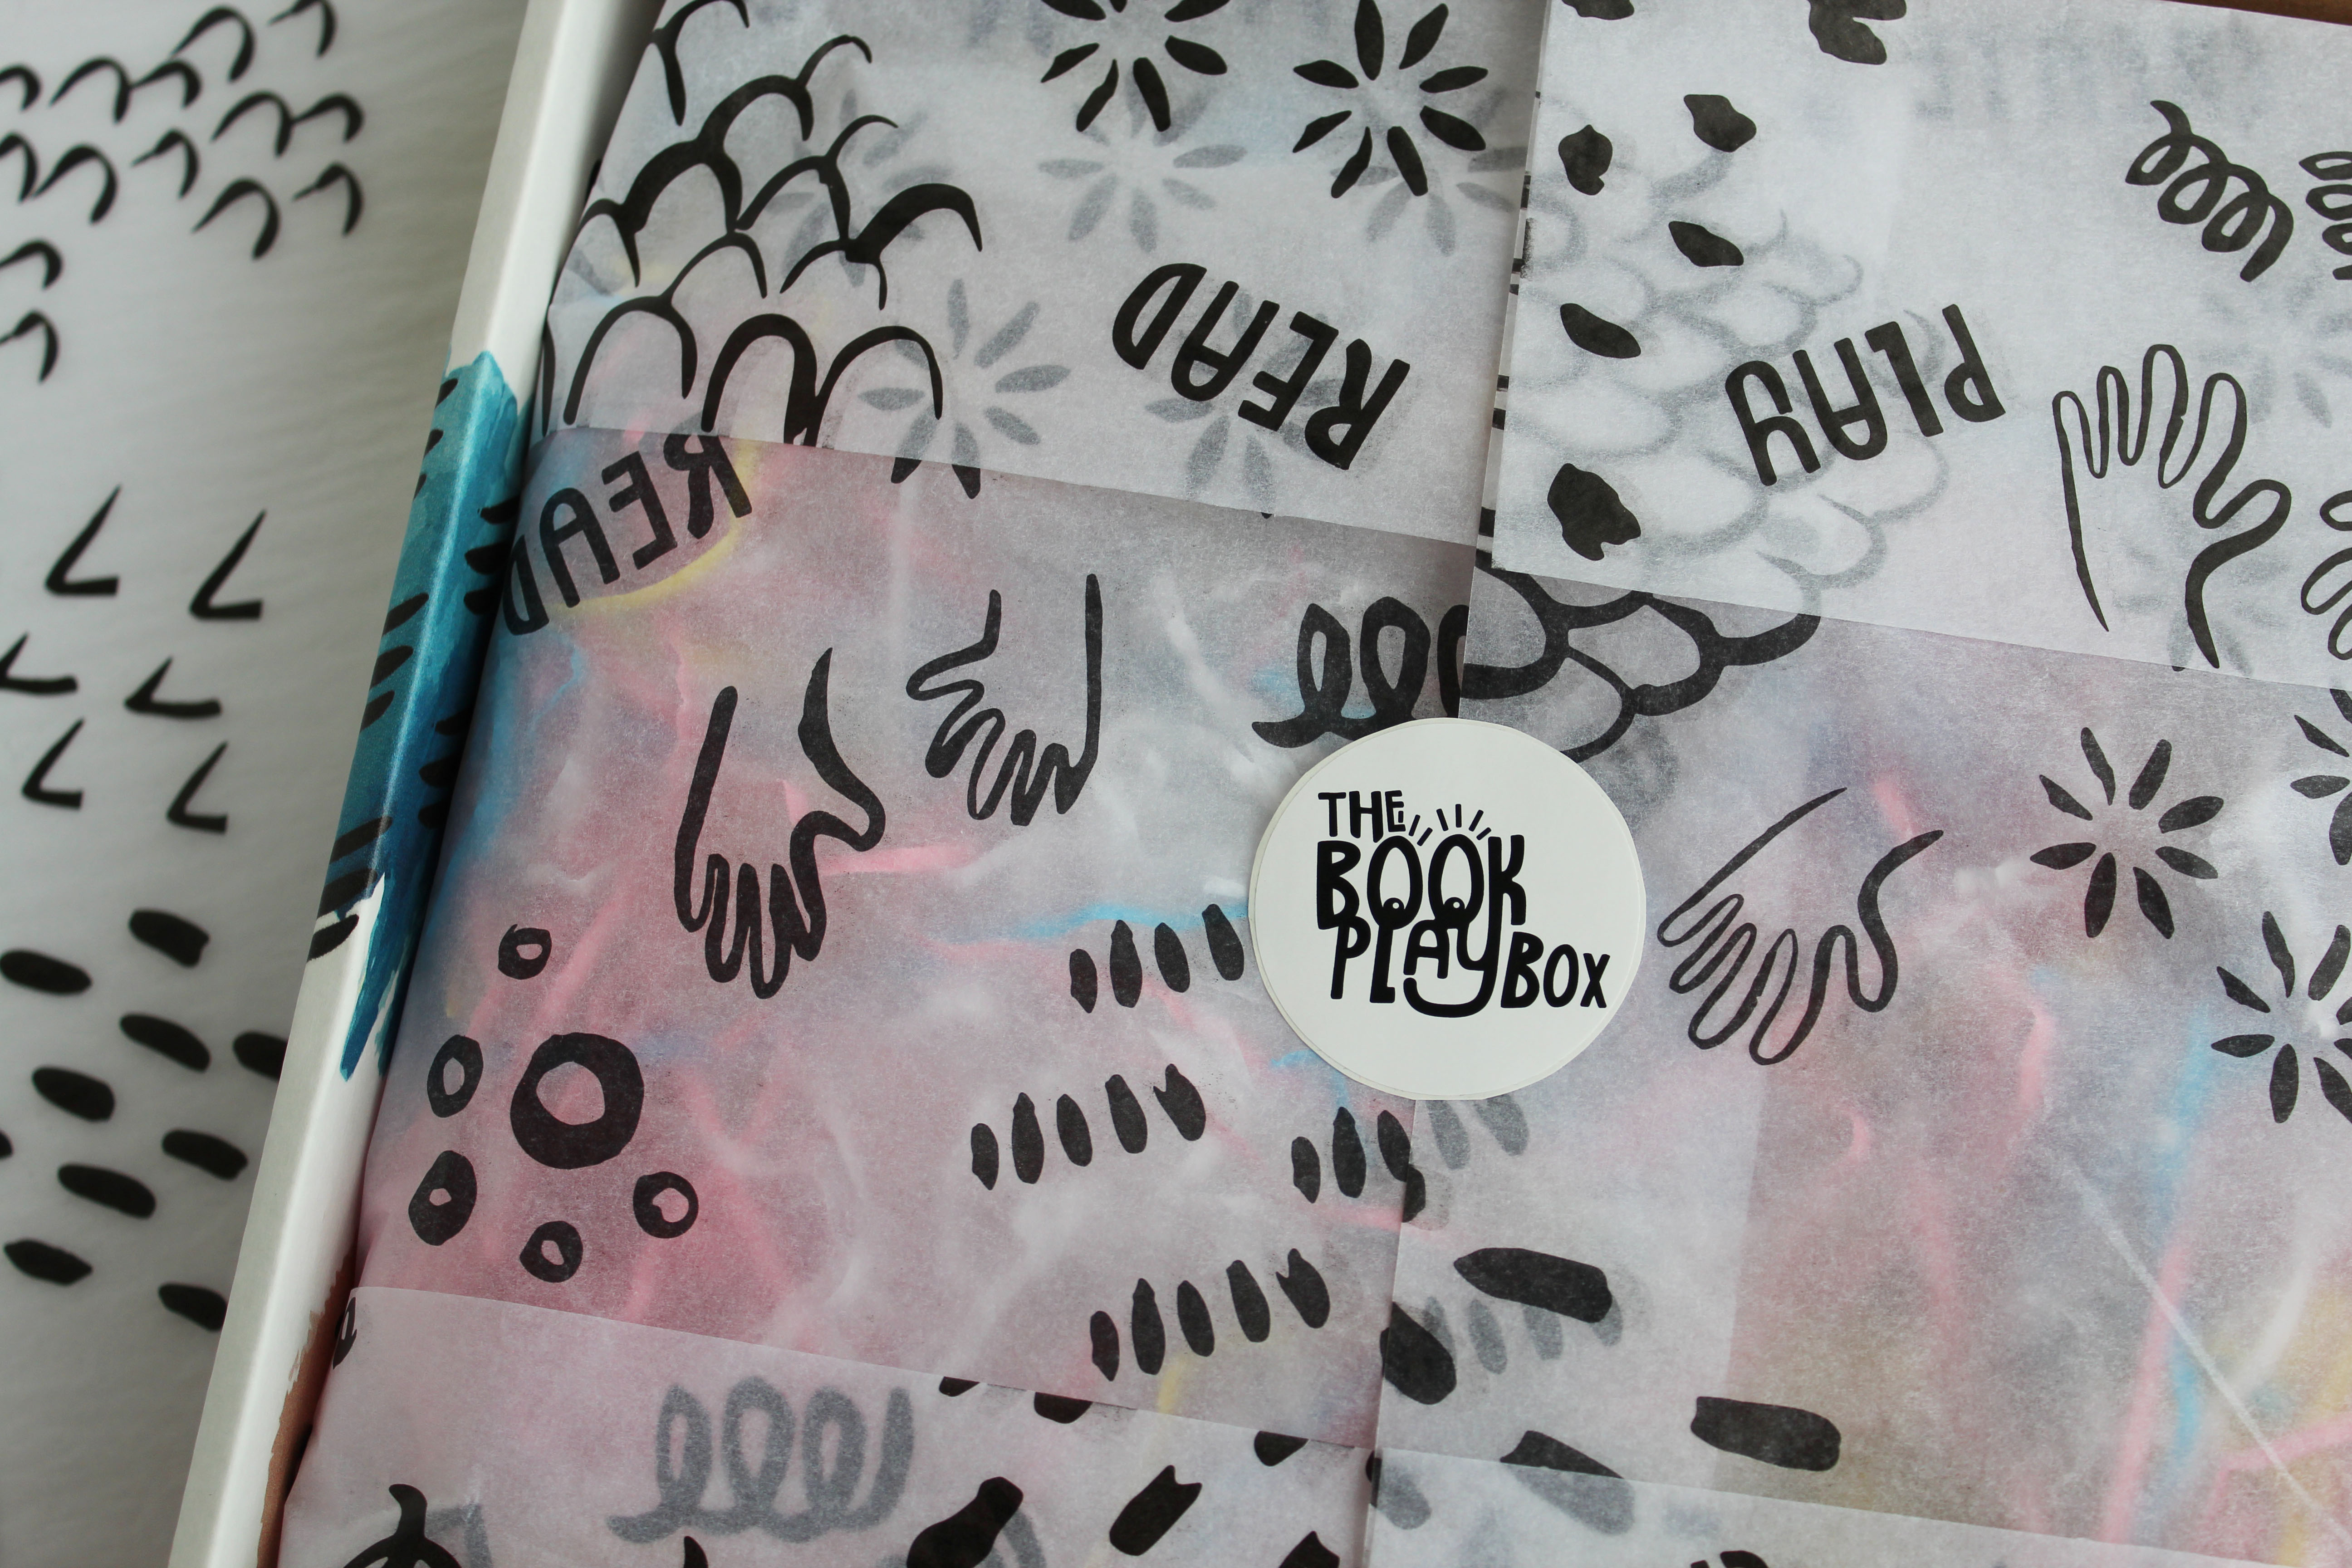 Close-up of The Book Playbox custom sticker